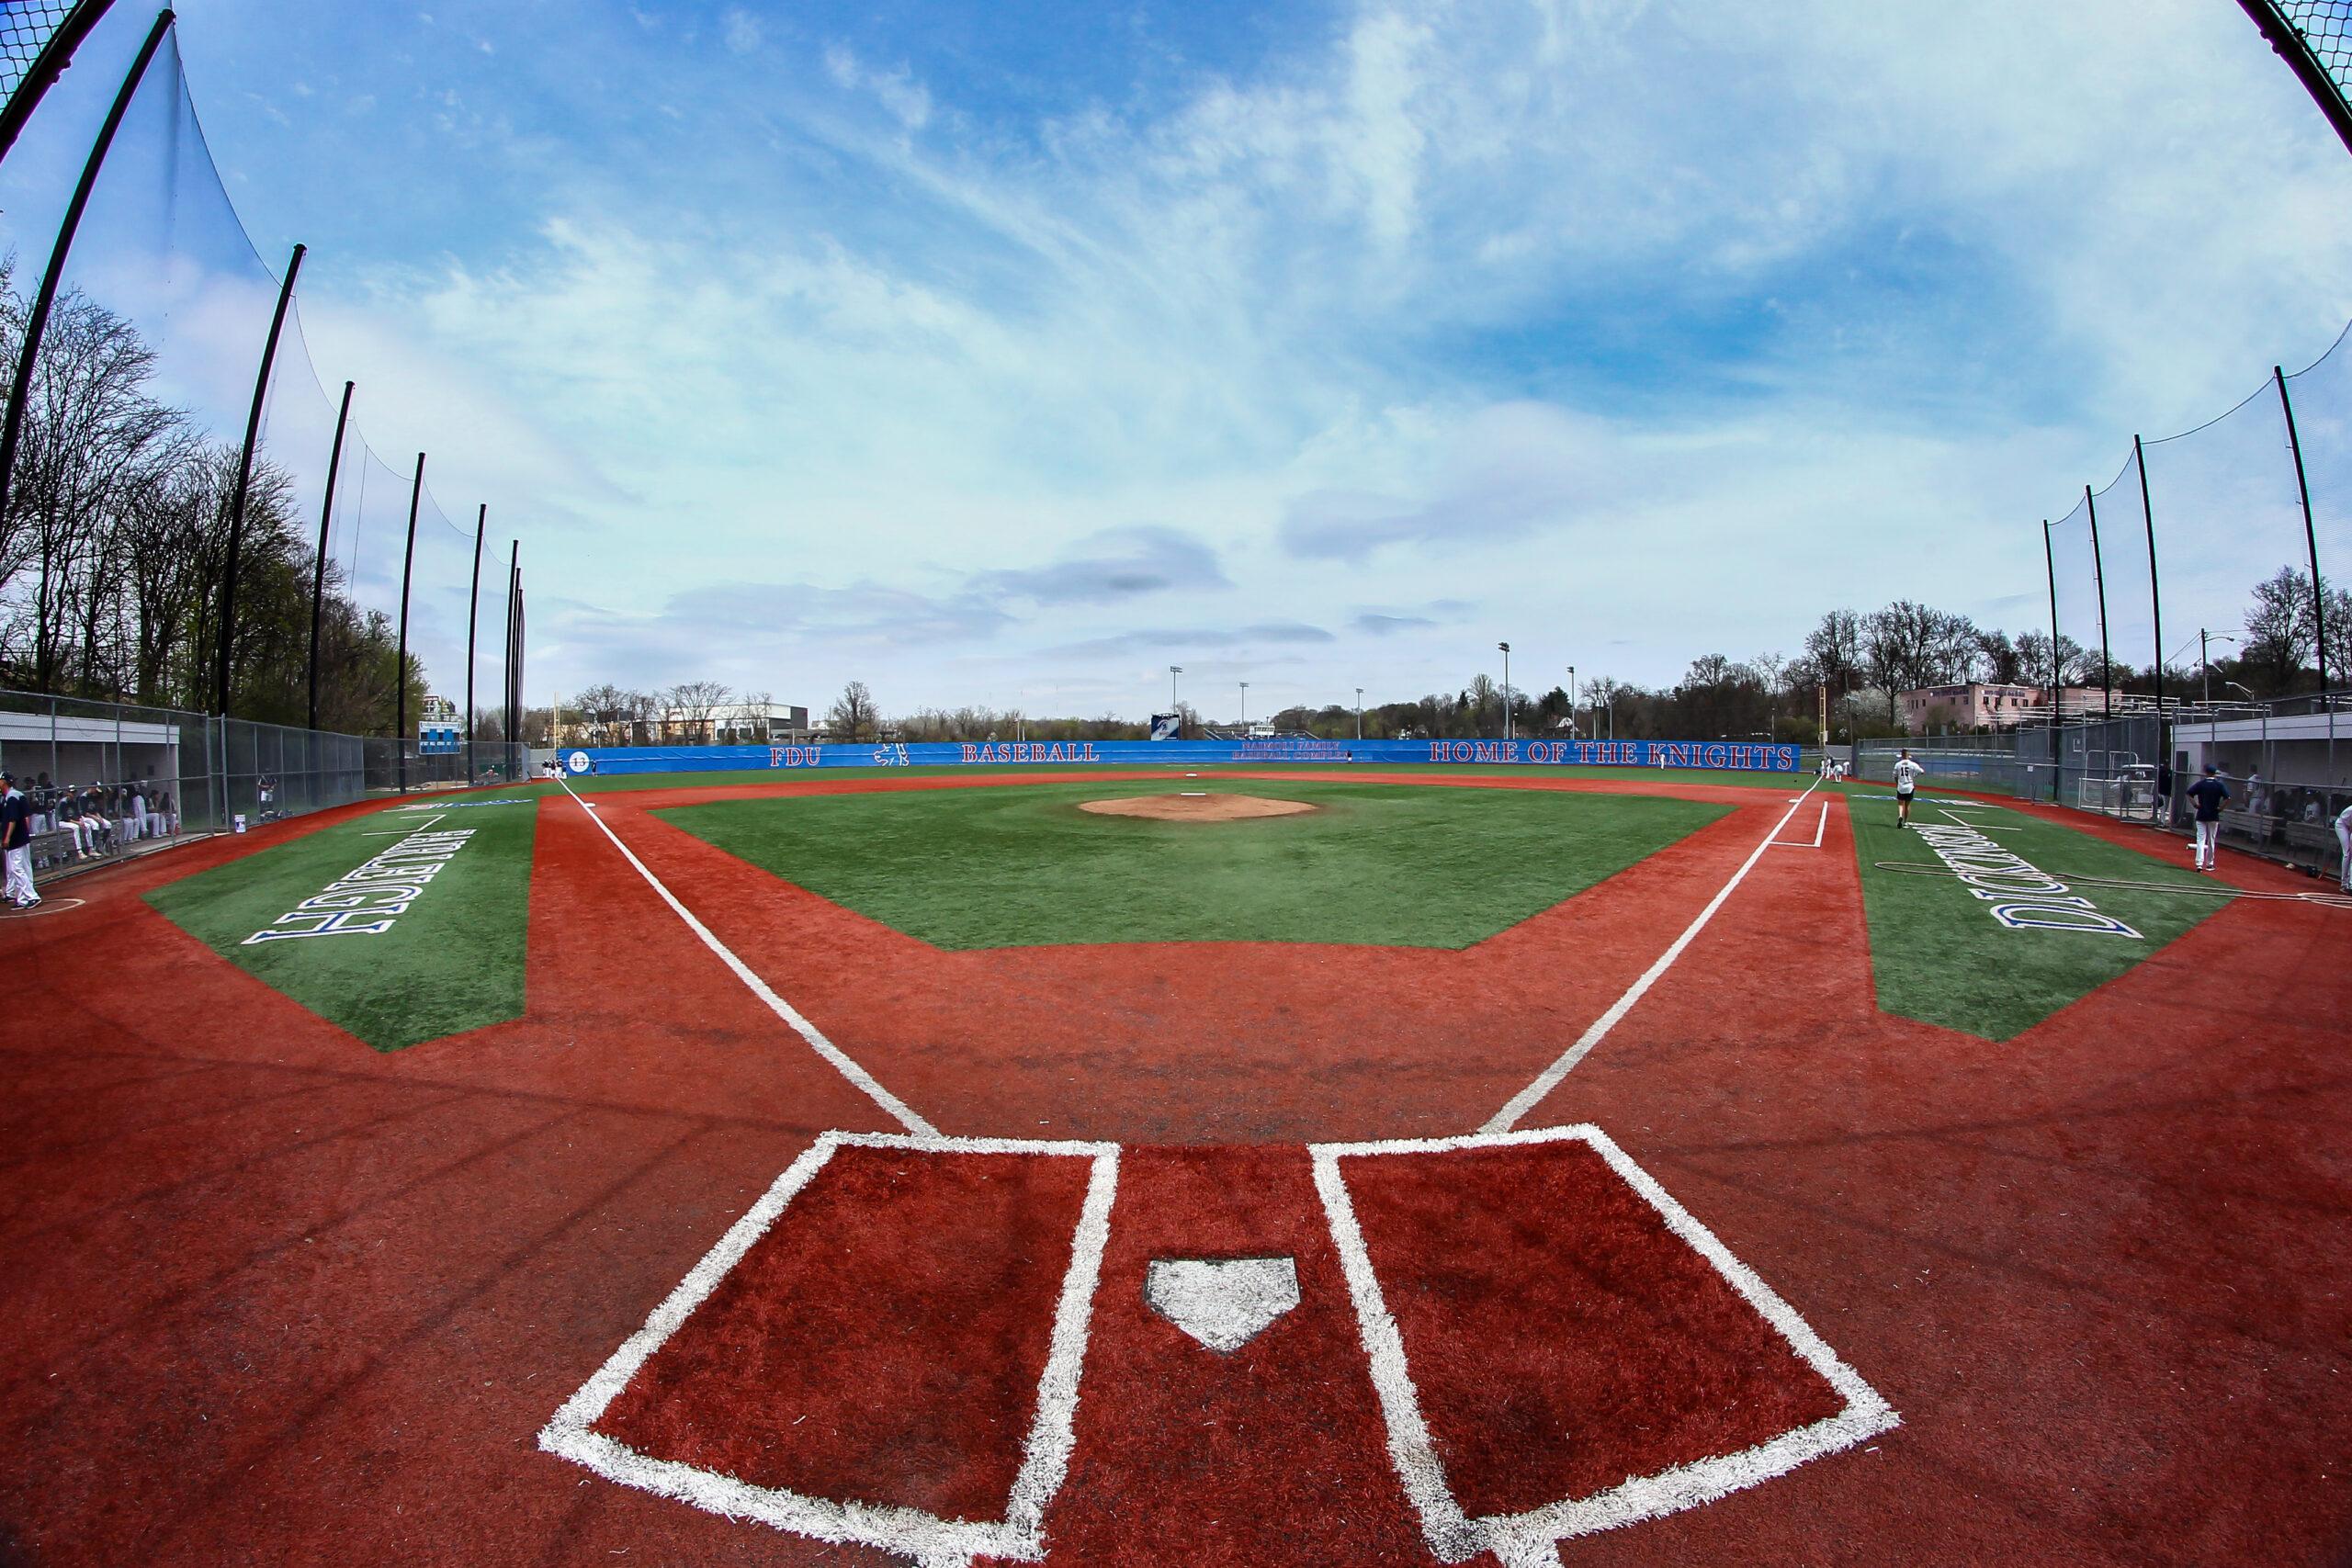 Naimoli baseball complex